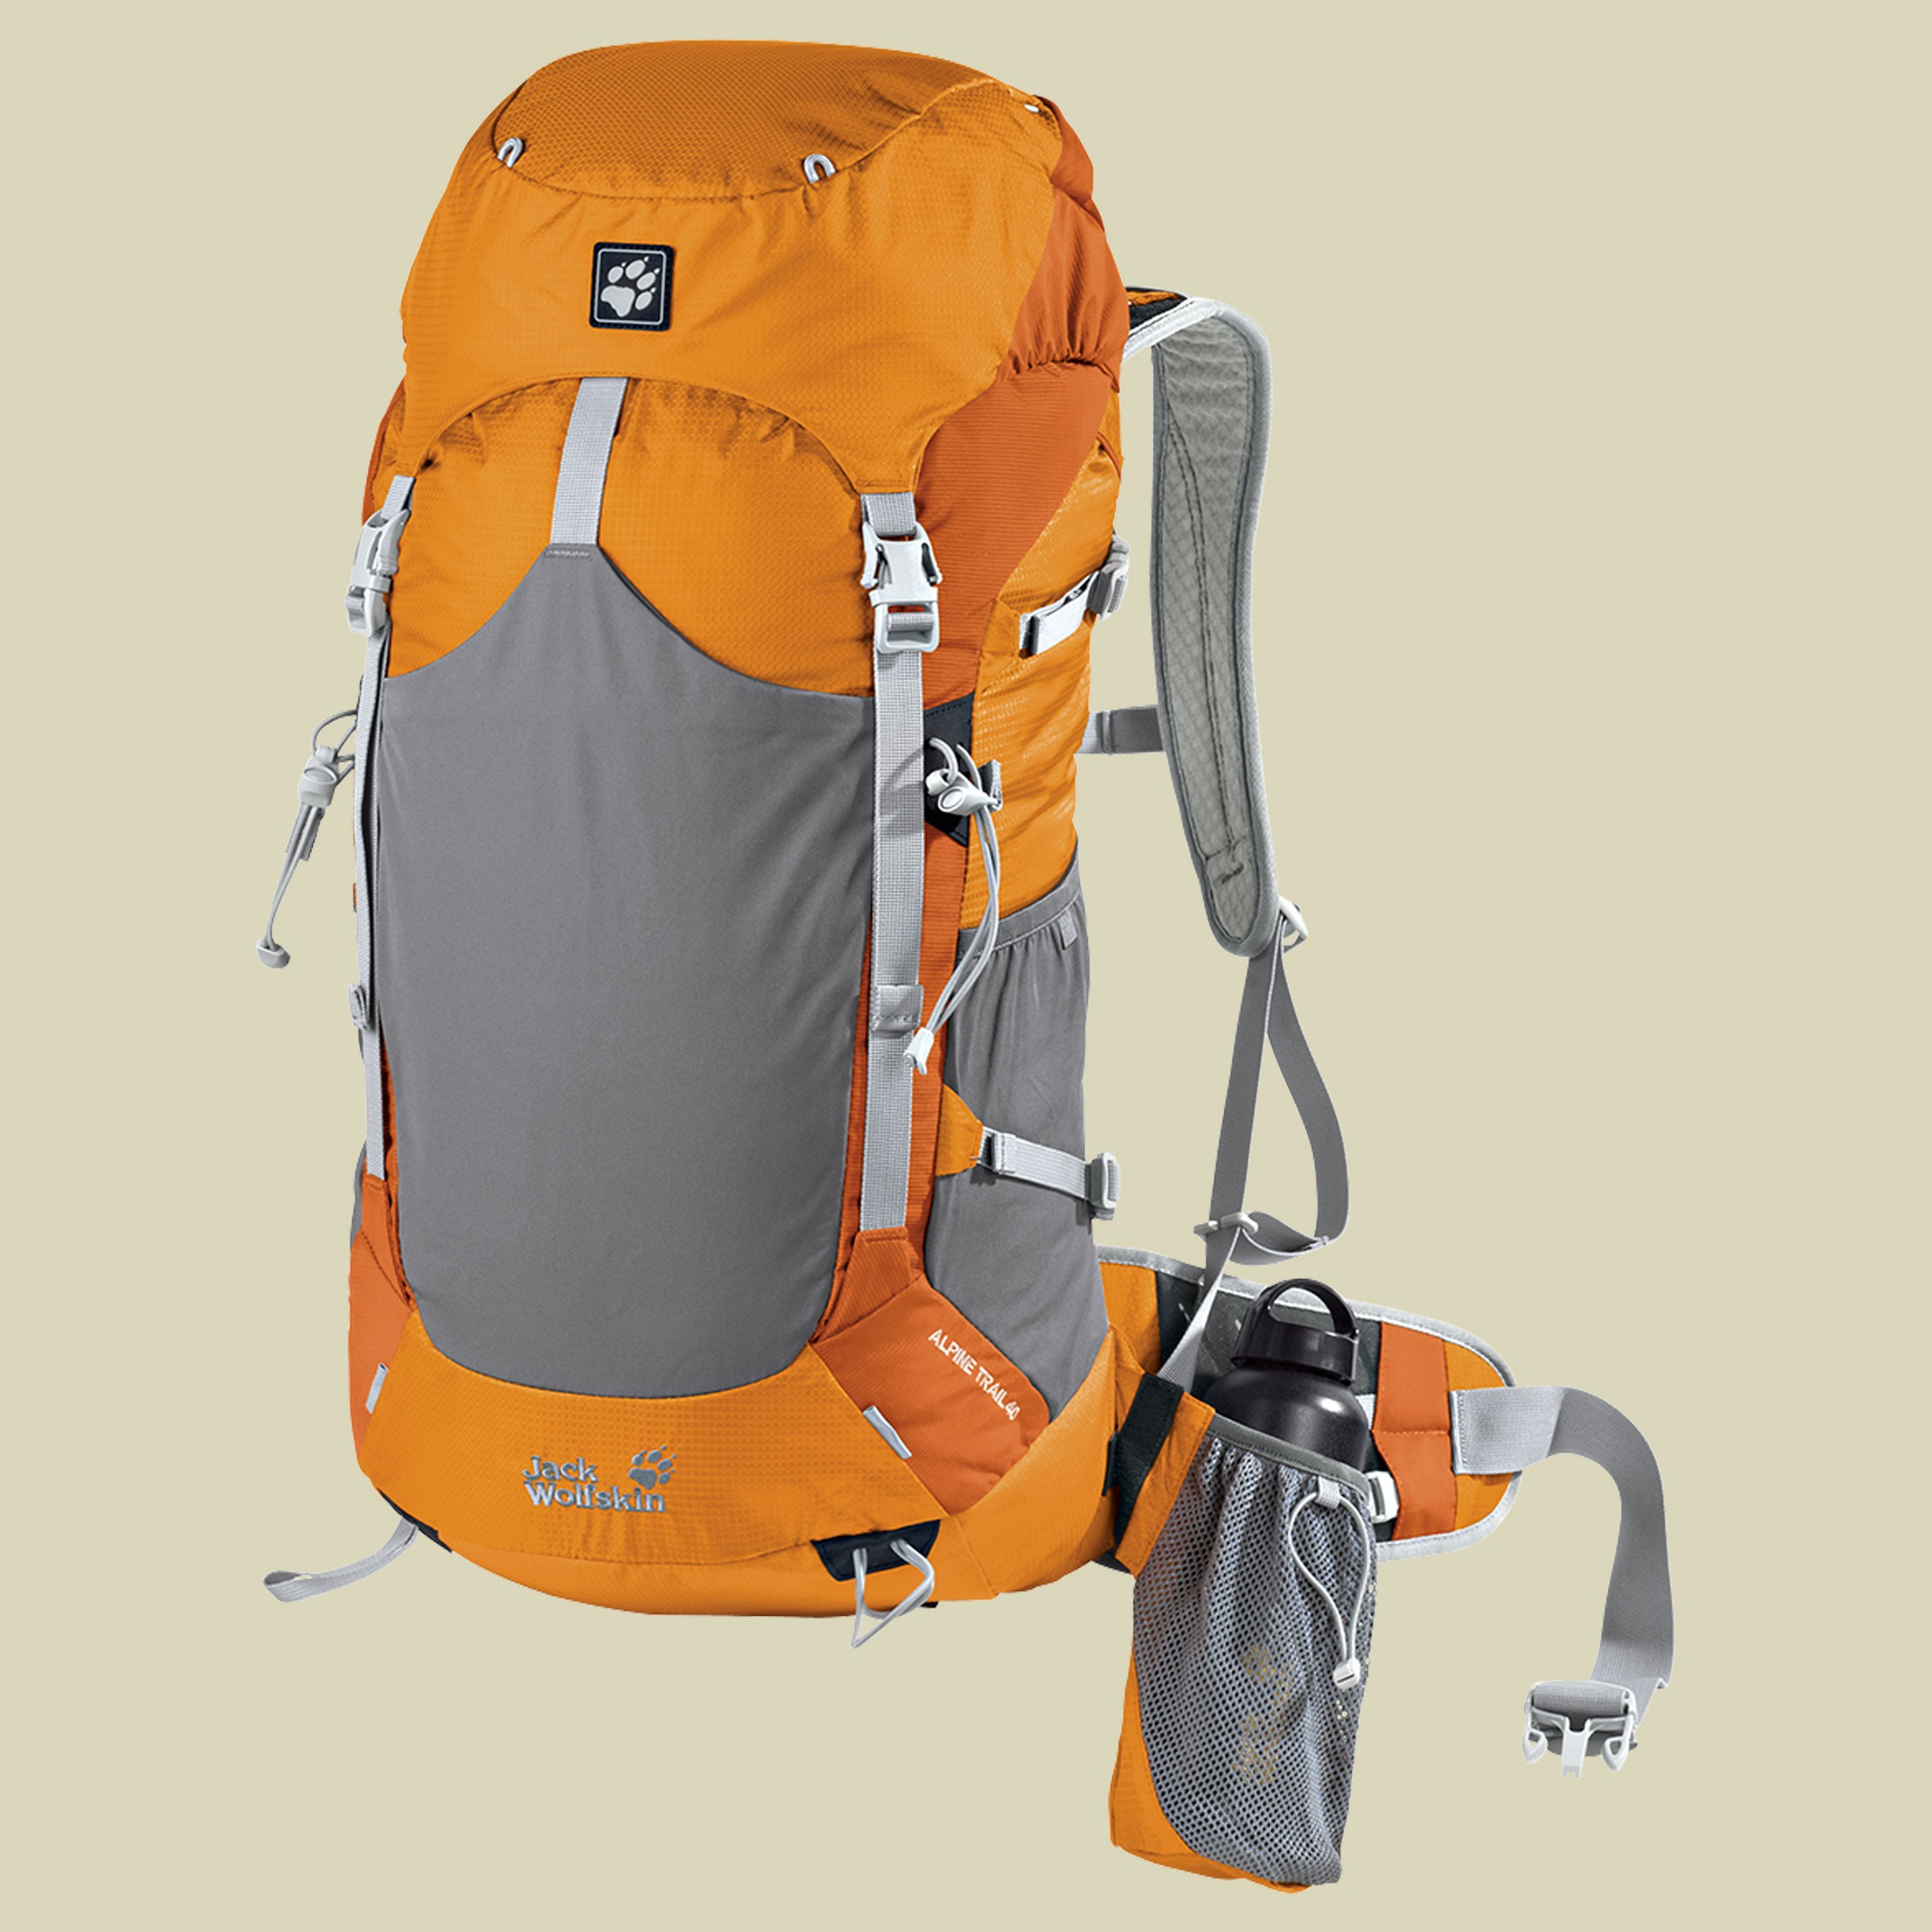 Jack Wolfskin Alpine Trail 40 Litre Mountain Trekking